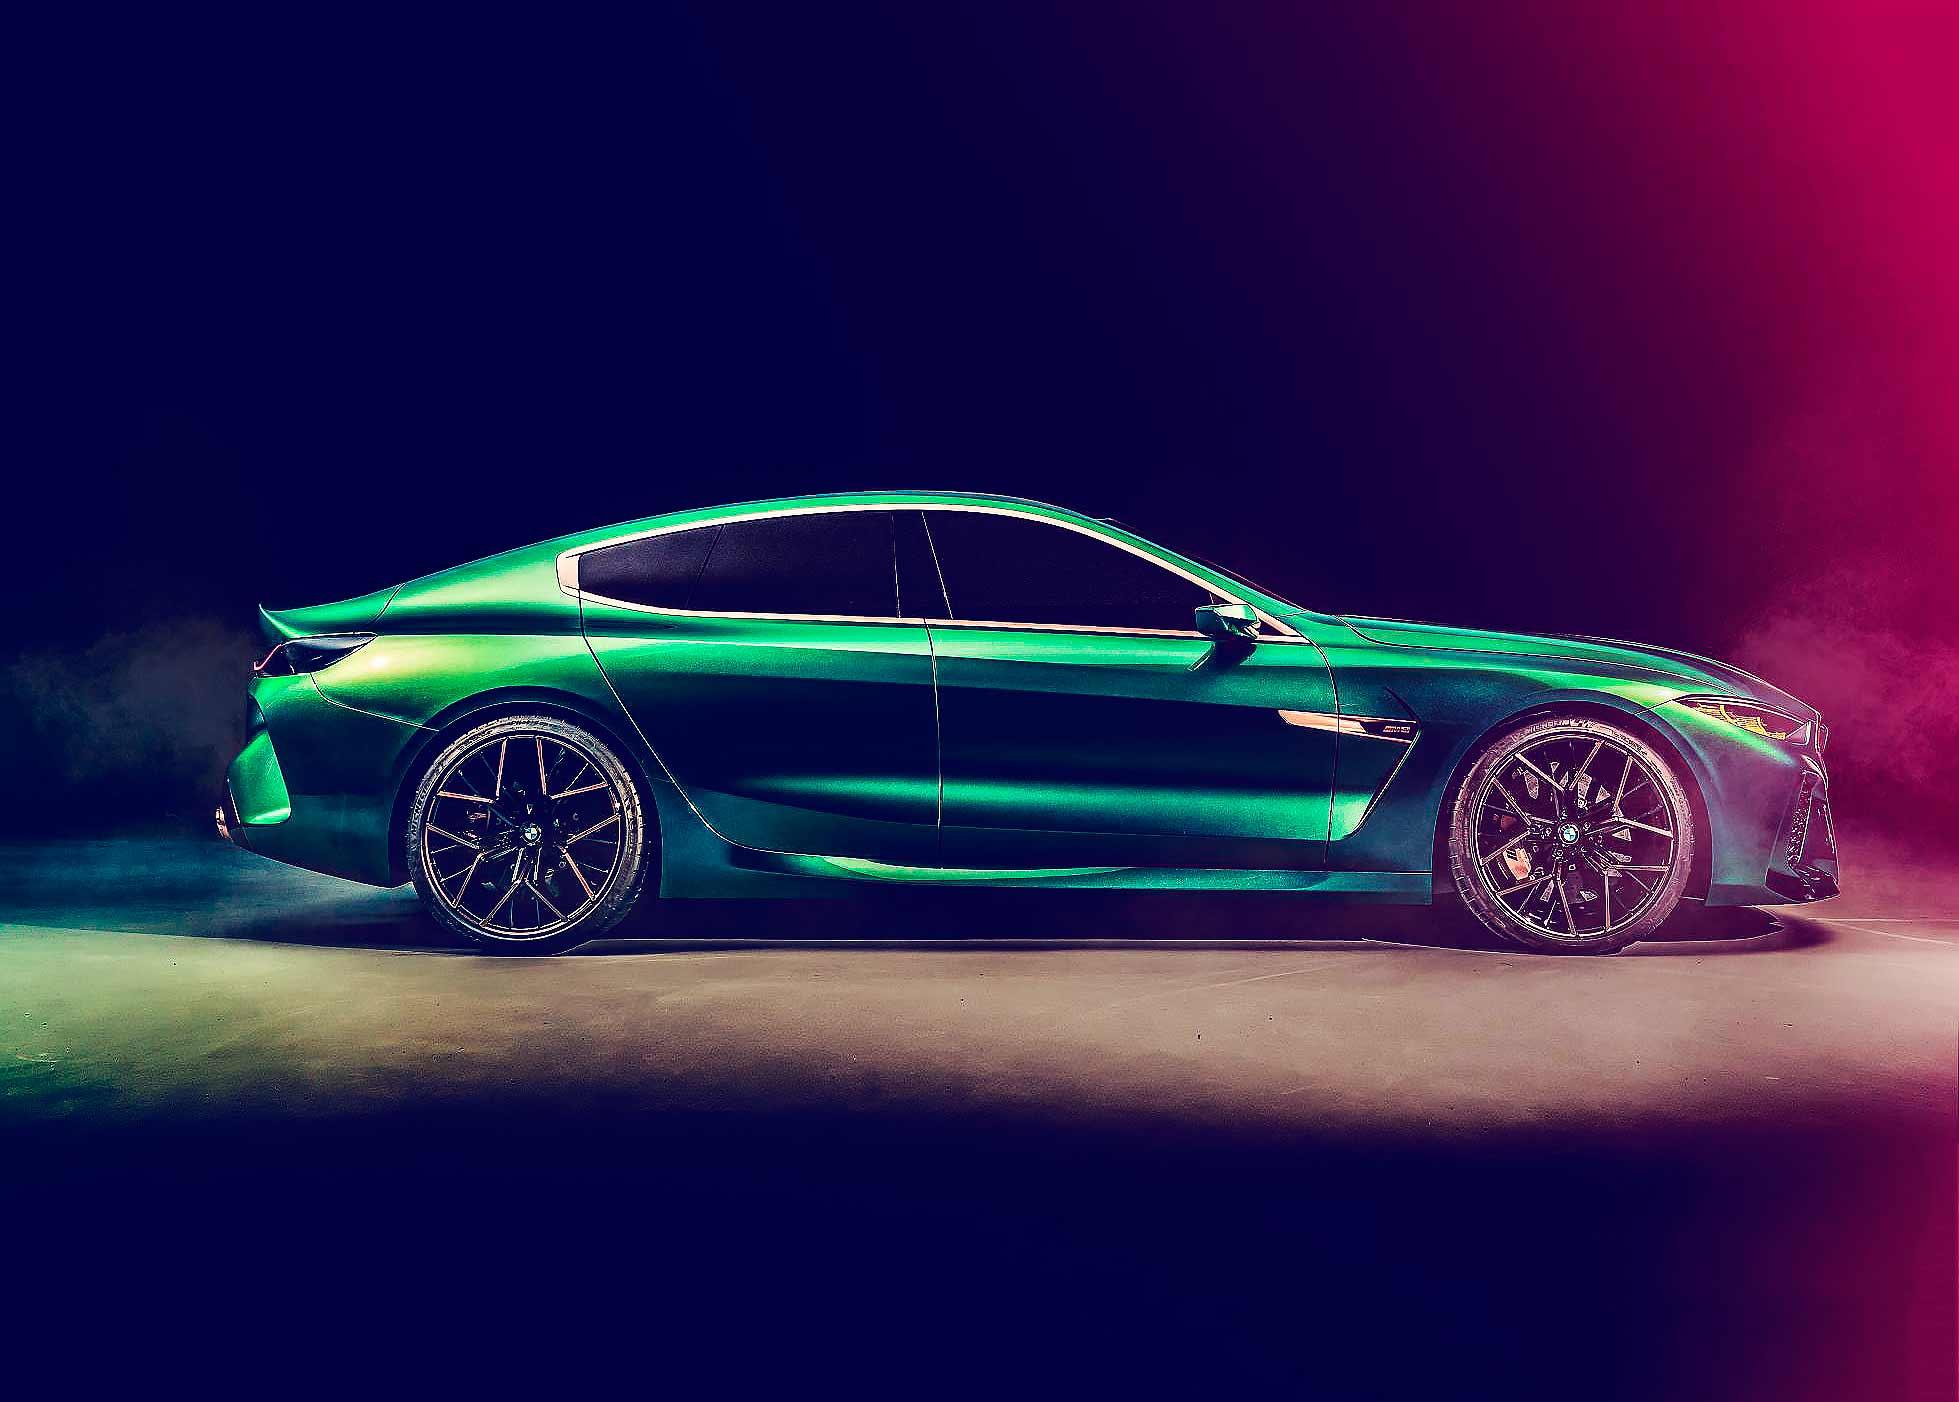 2019 Bmw M8 Gran Coupe Concept Drive My Blogs Drive